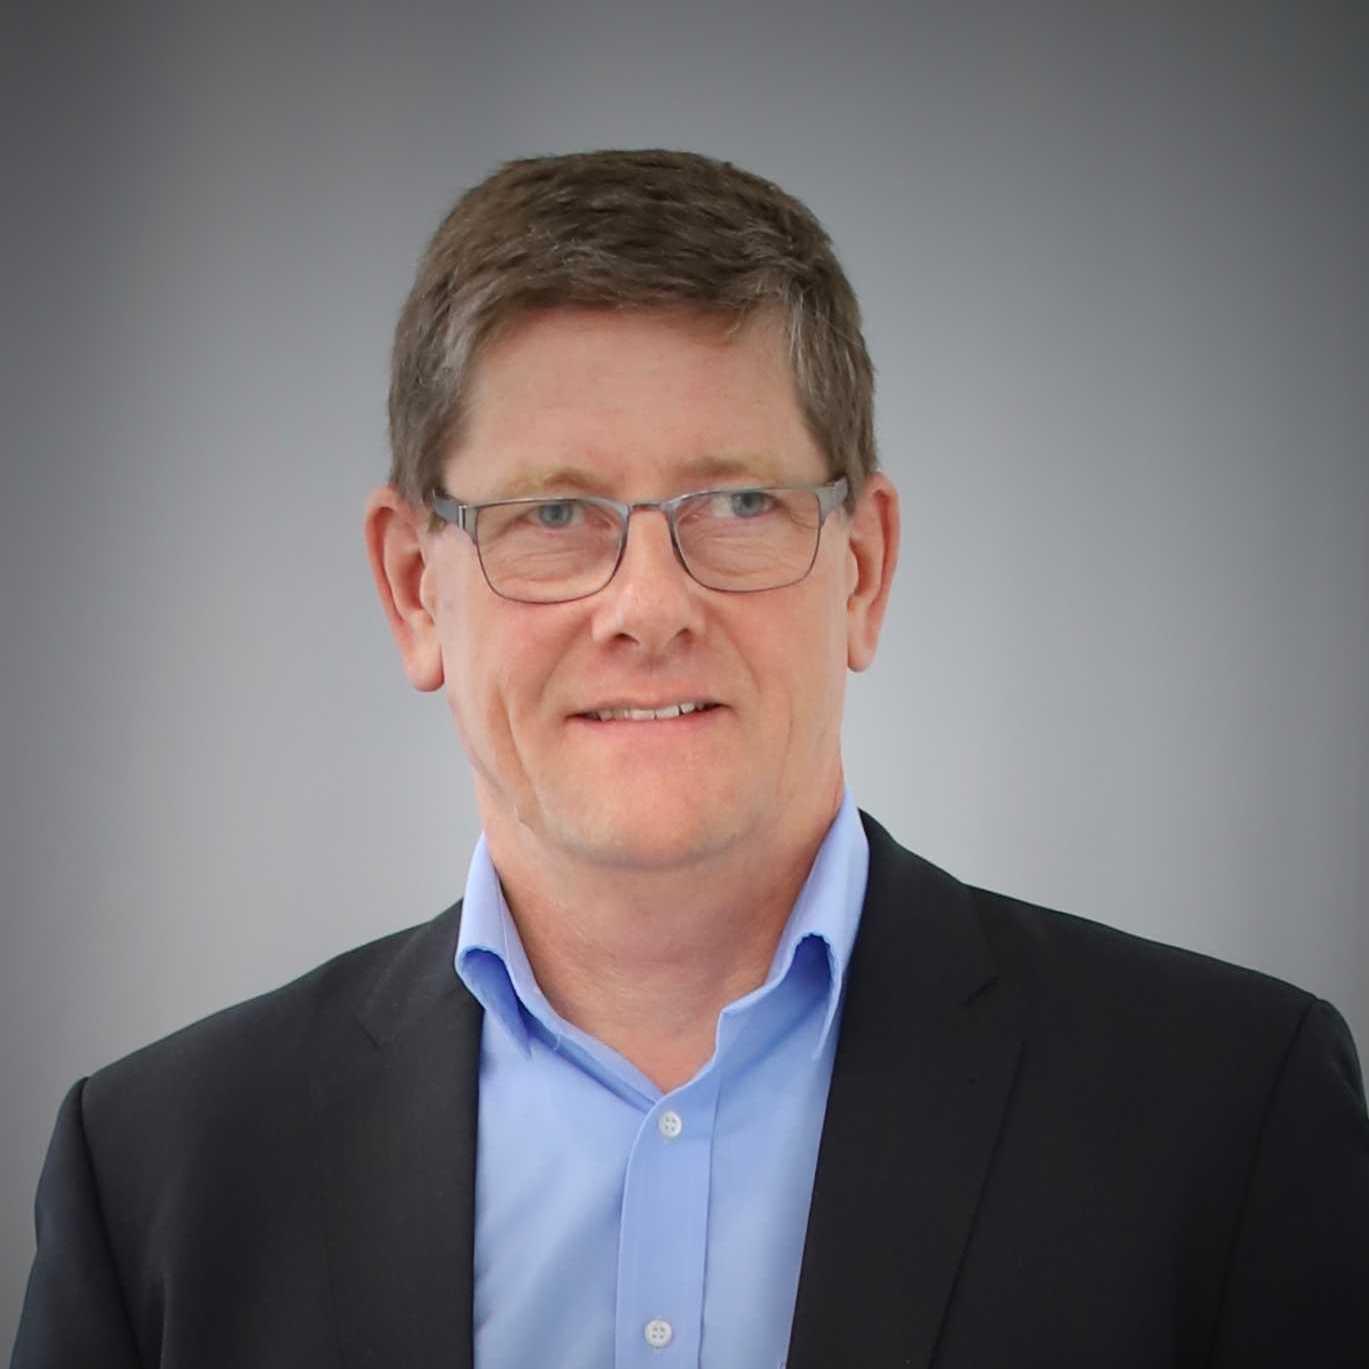 Jan-Peter Meyer-Kahlen